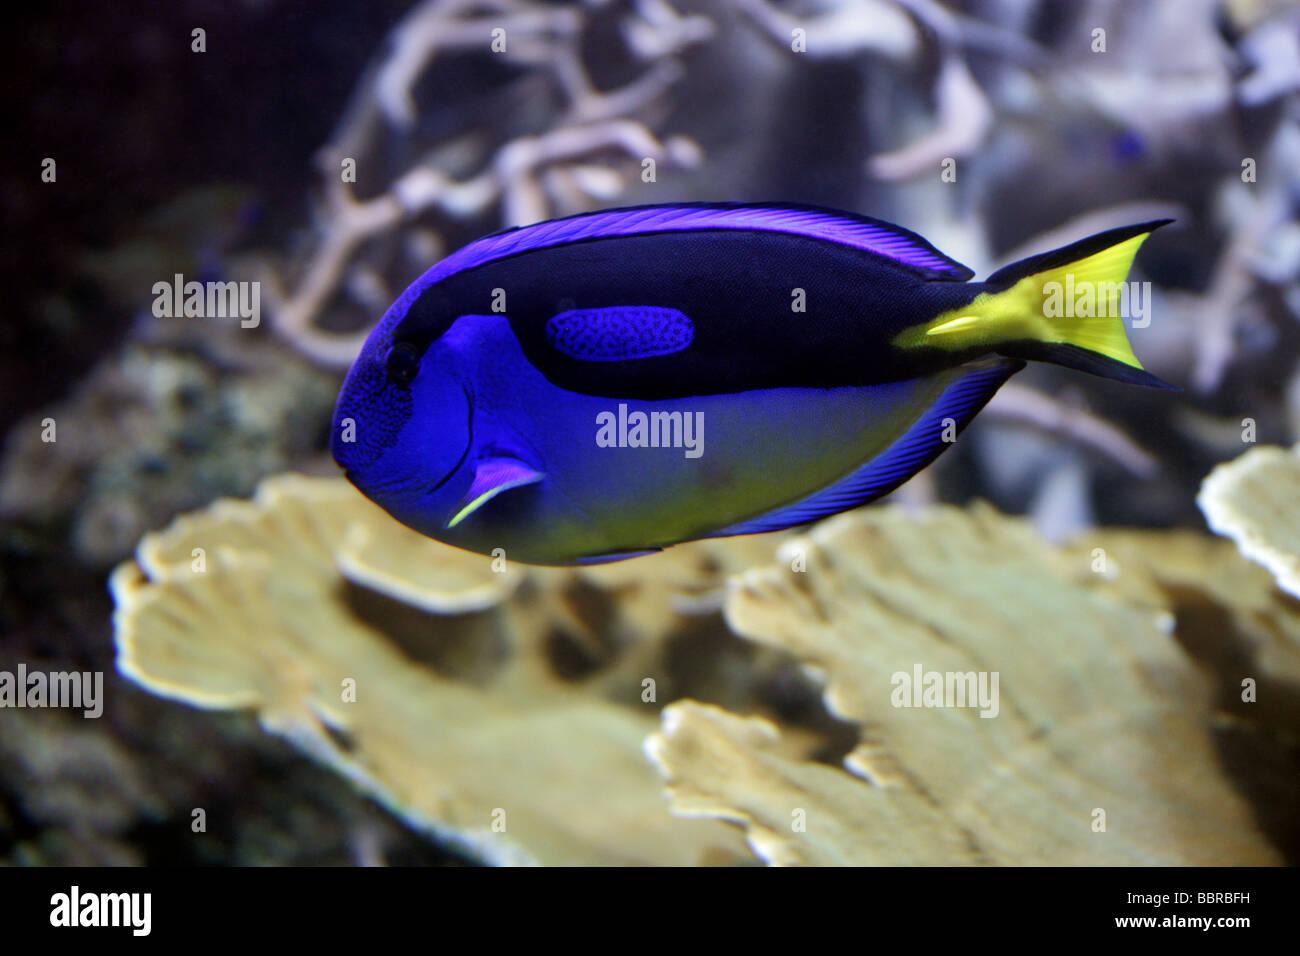 Regal Tang, Paracanthurus hepatus, Acanthuridae, Perciformes - Stock Image